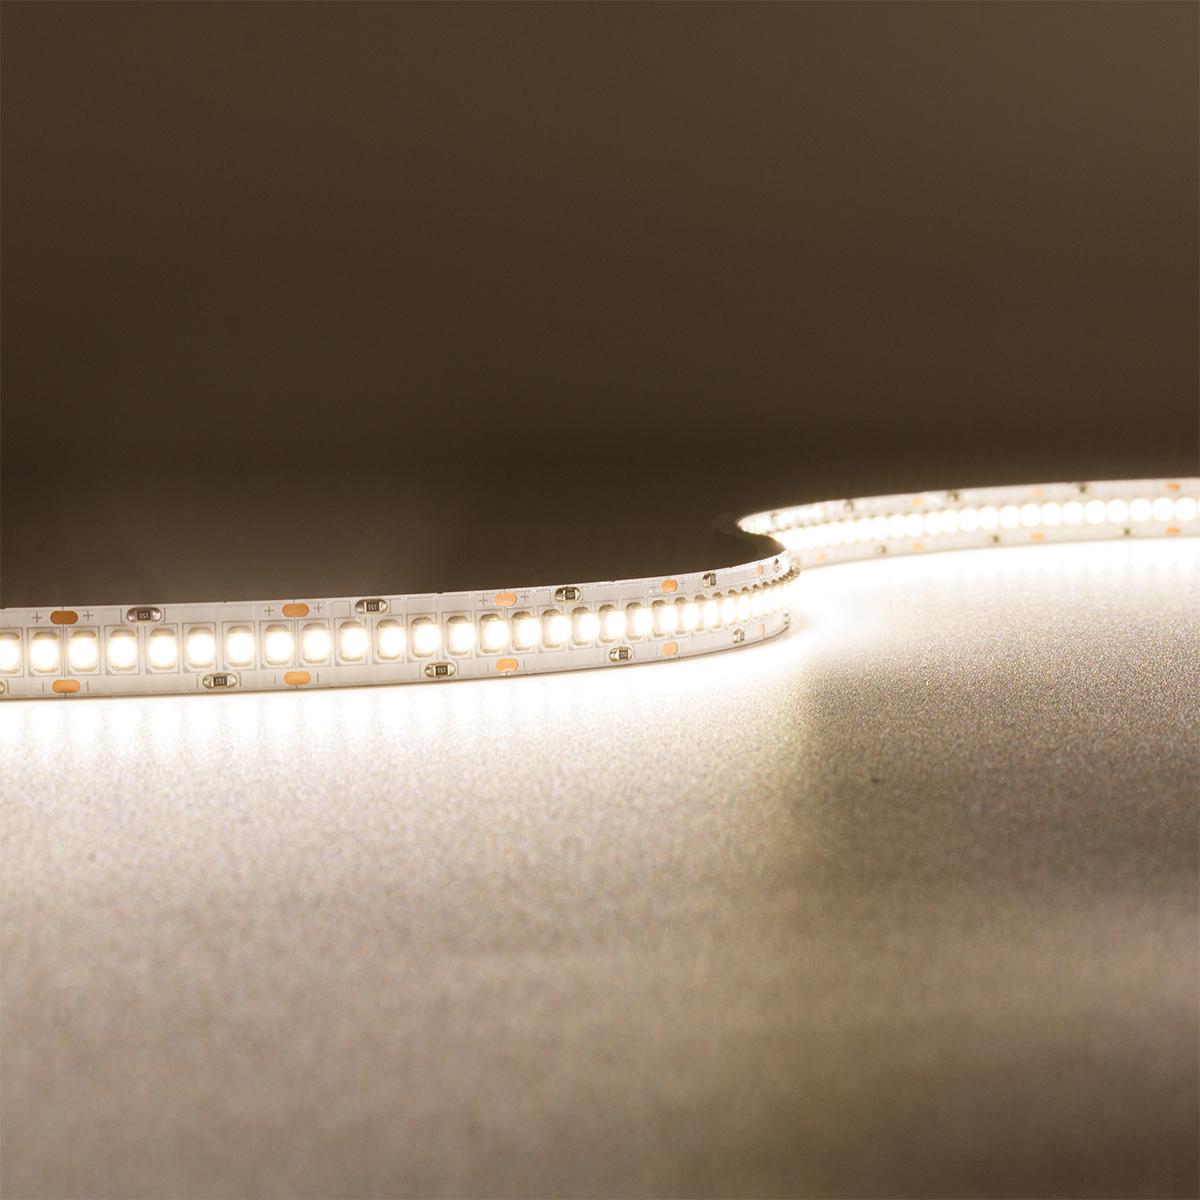 Strip Neutralweiß 24V LED Streifen 5M 19,2W/m 240LED/m 10mm IP20 4000K